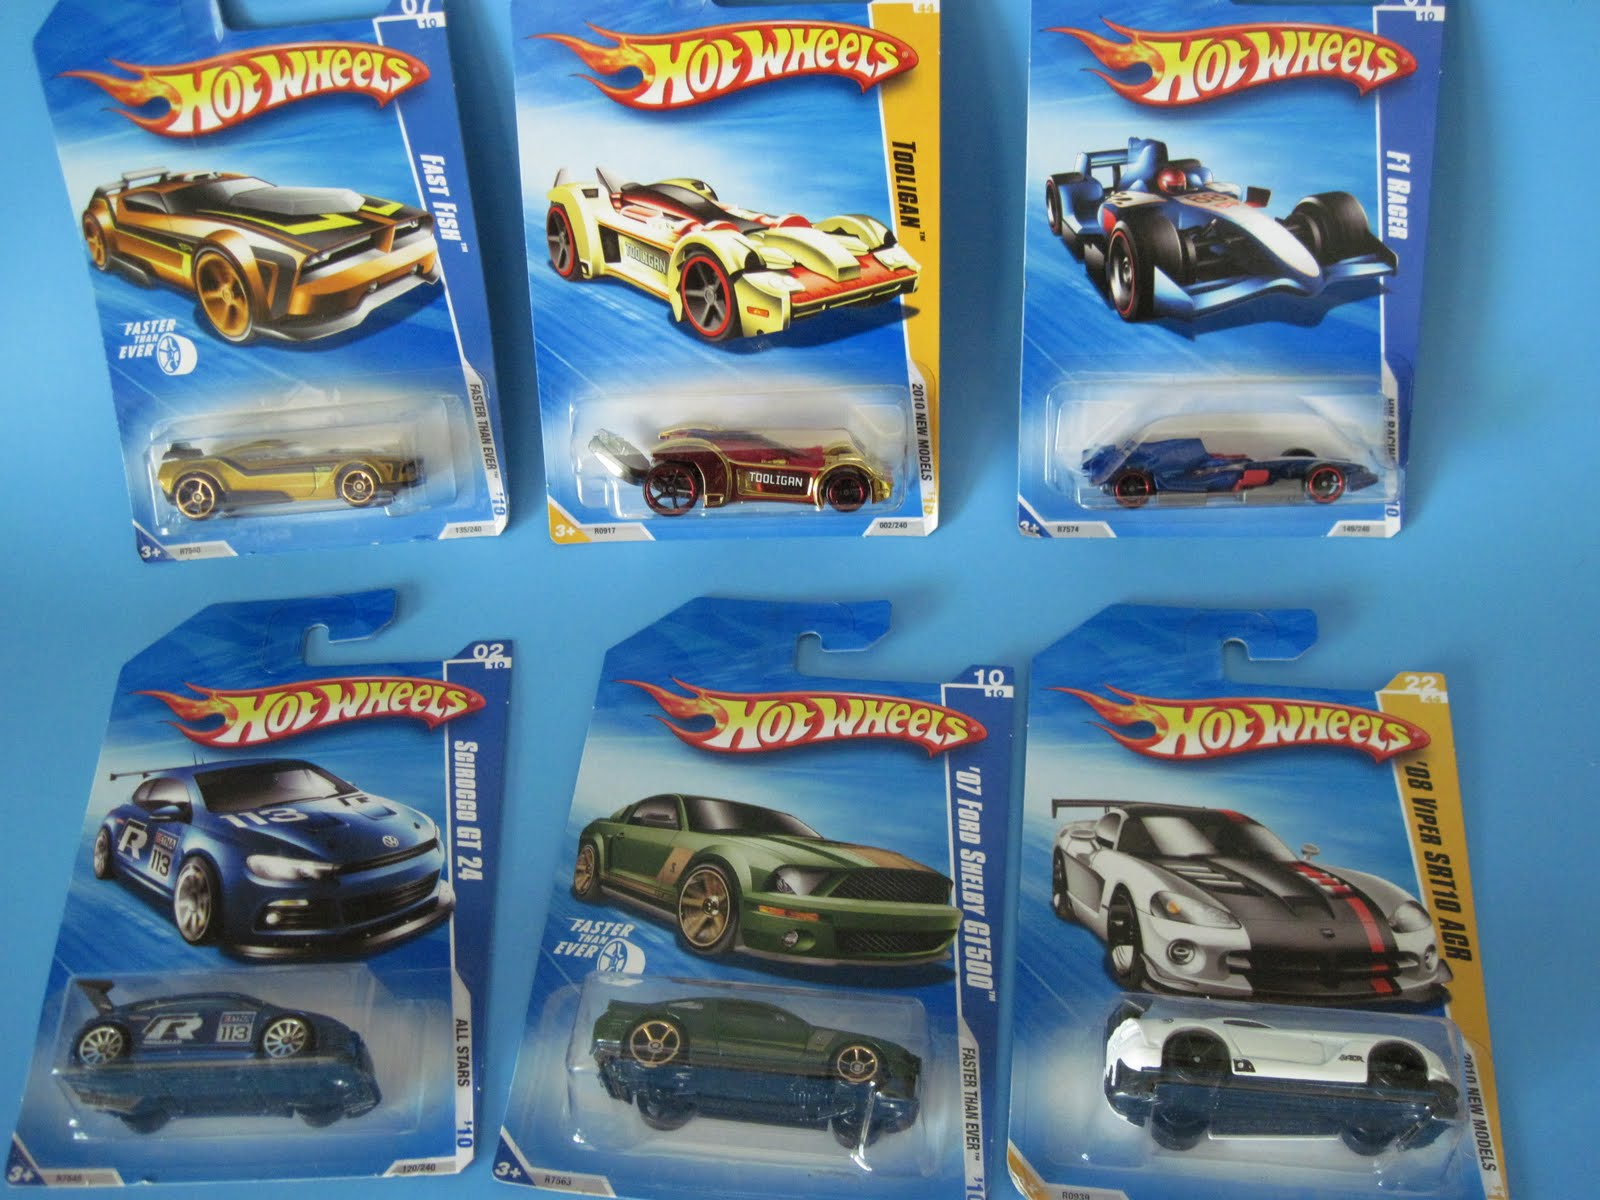 Walgreens Toys For Boys : Best buy hot wheels at walgreens for stewardshop